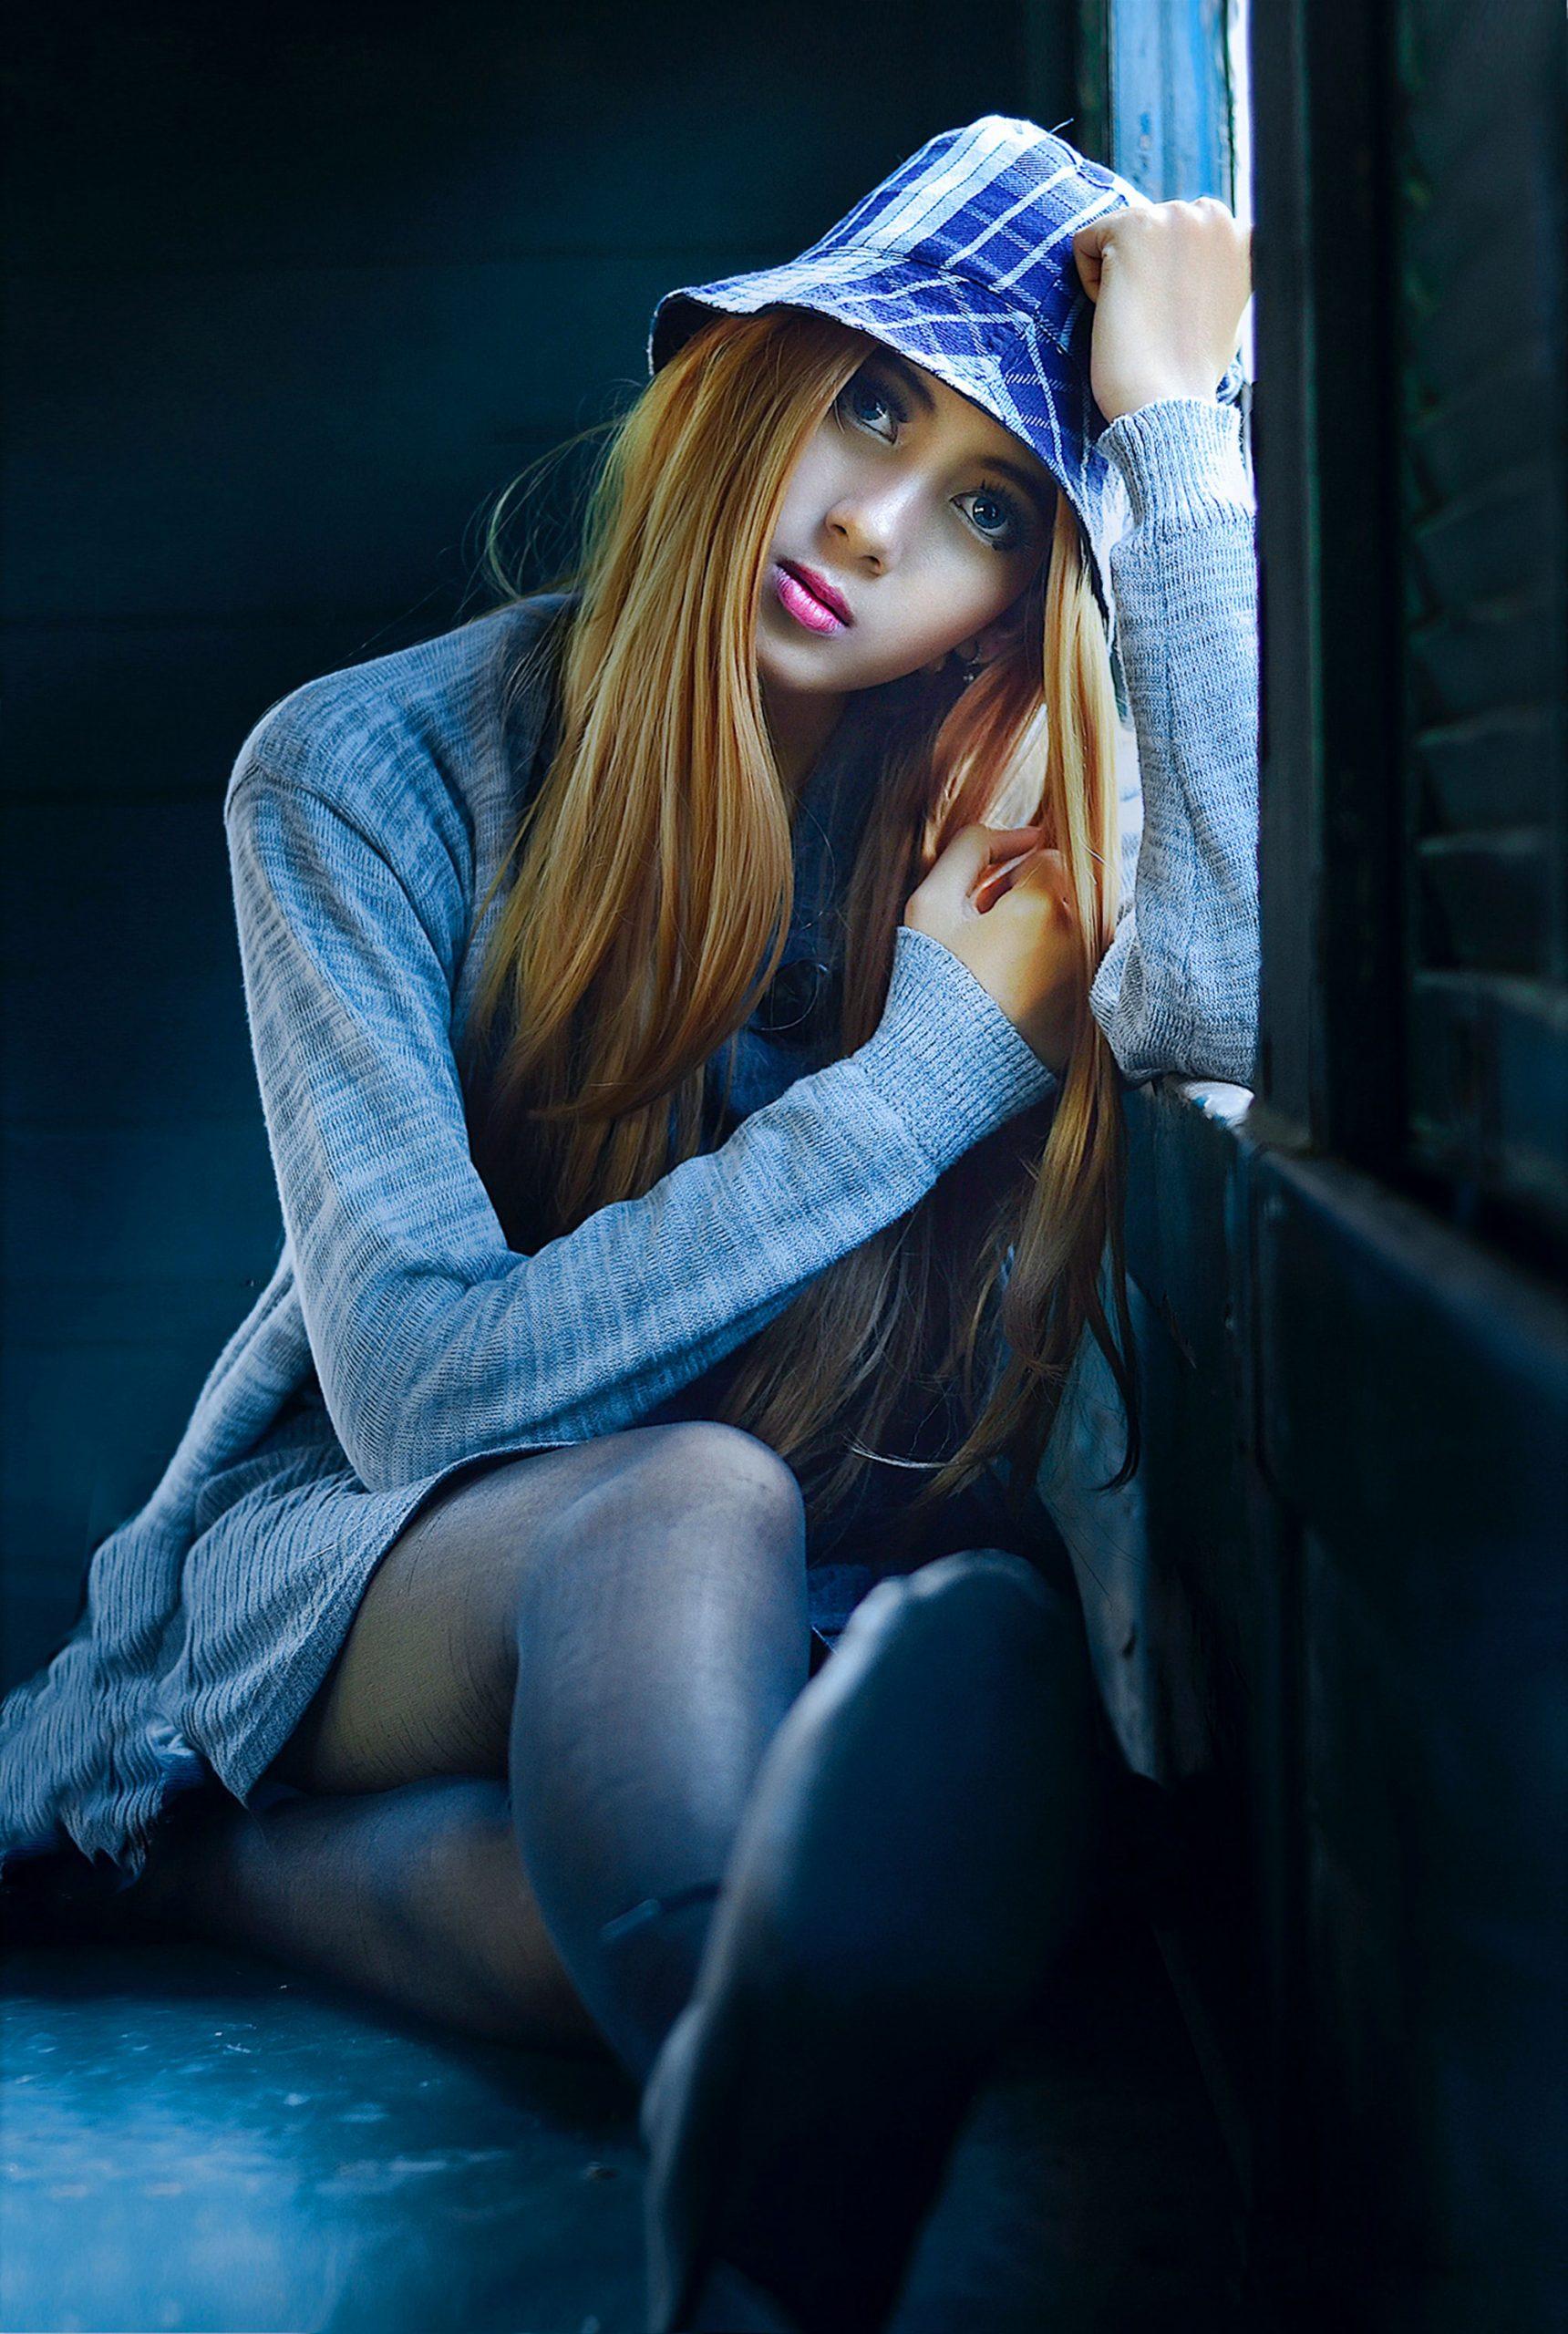 1080p free hd Very Sad Girl Whatsapp Dp Images